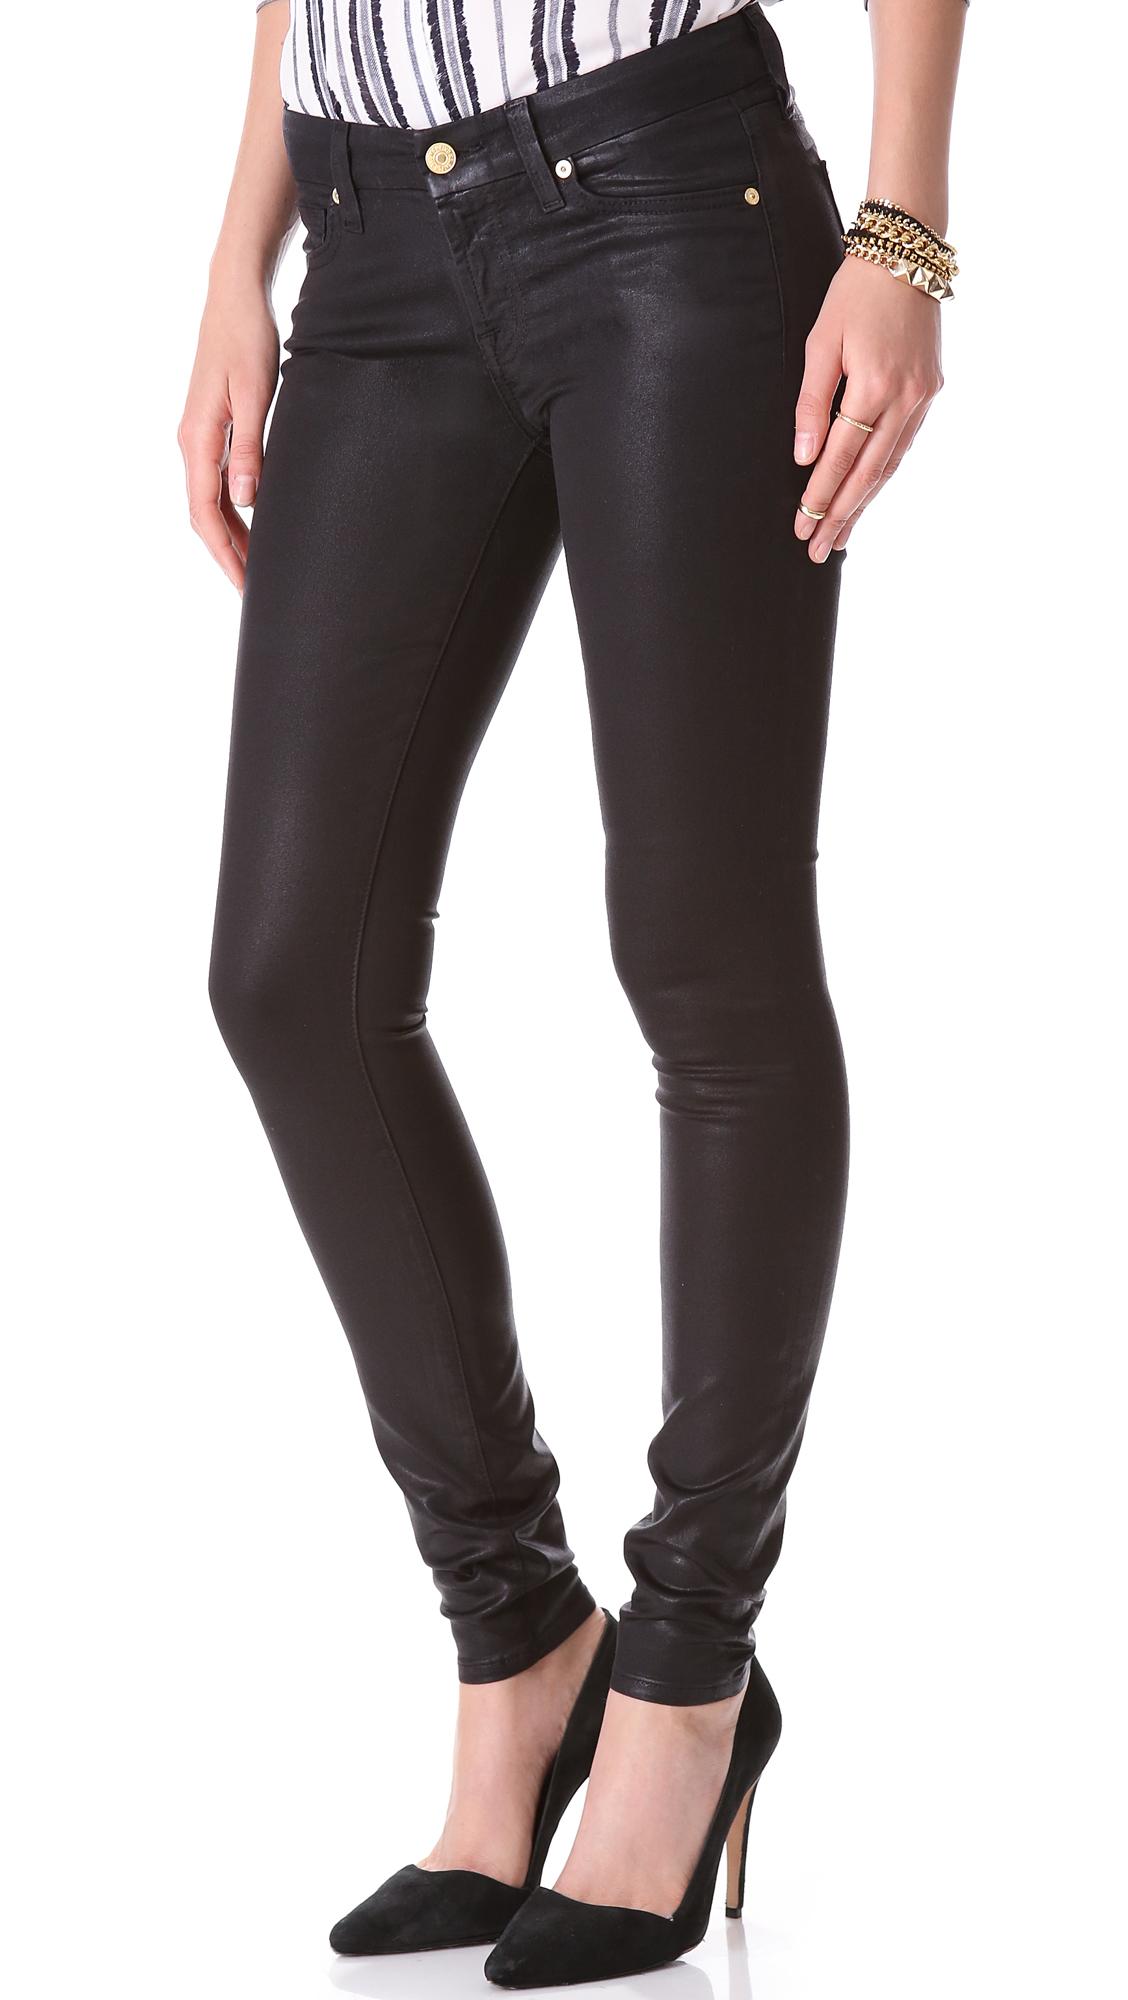 lyst 7 for all mankind high shine skinny jeans high shine black in black. Black Bedroom Furniture Sets. Home Design Ideas